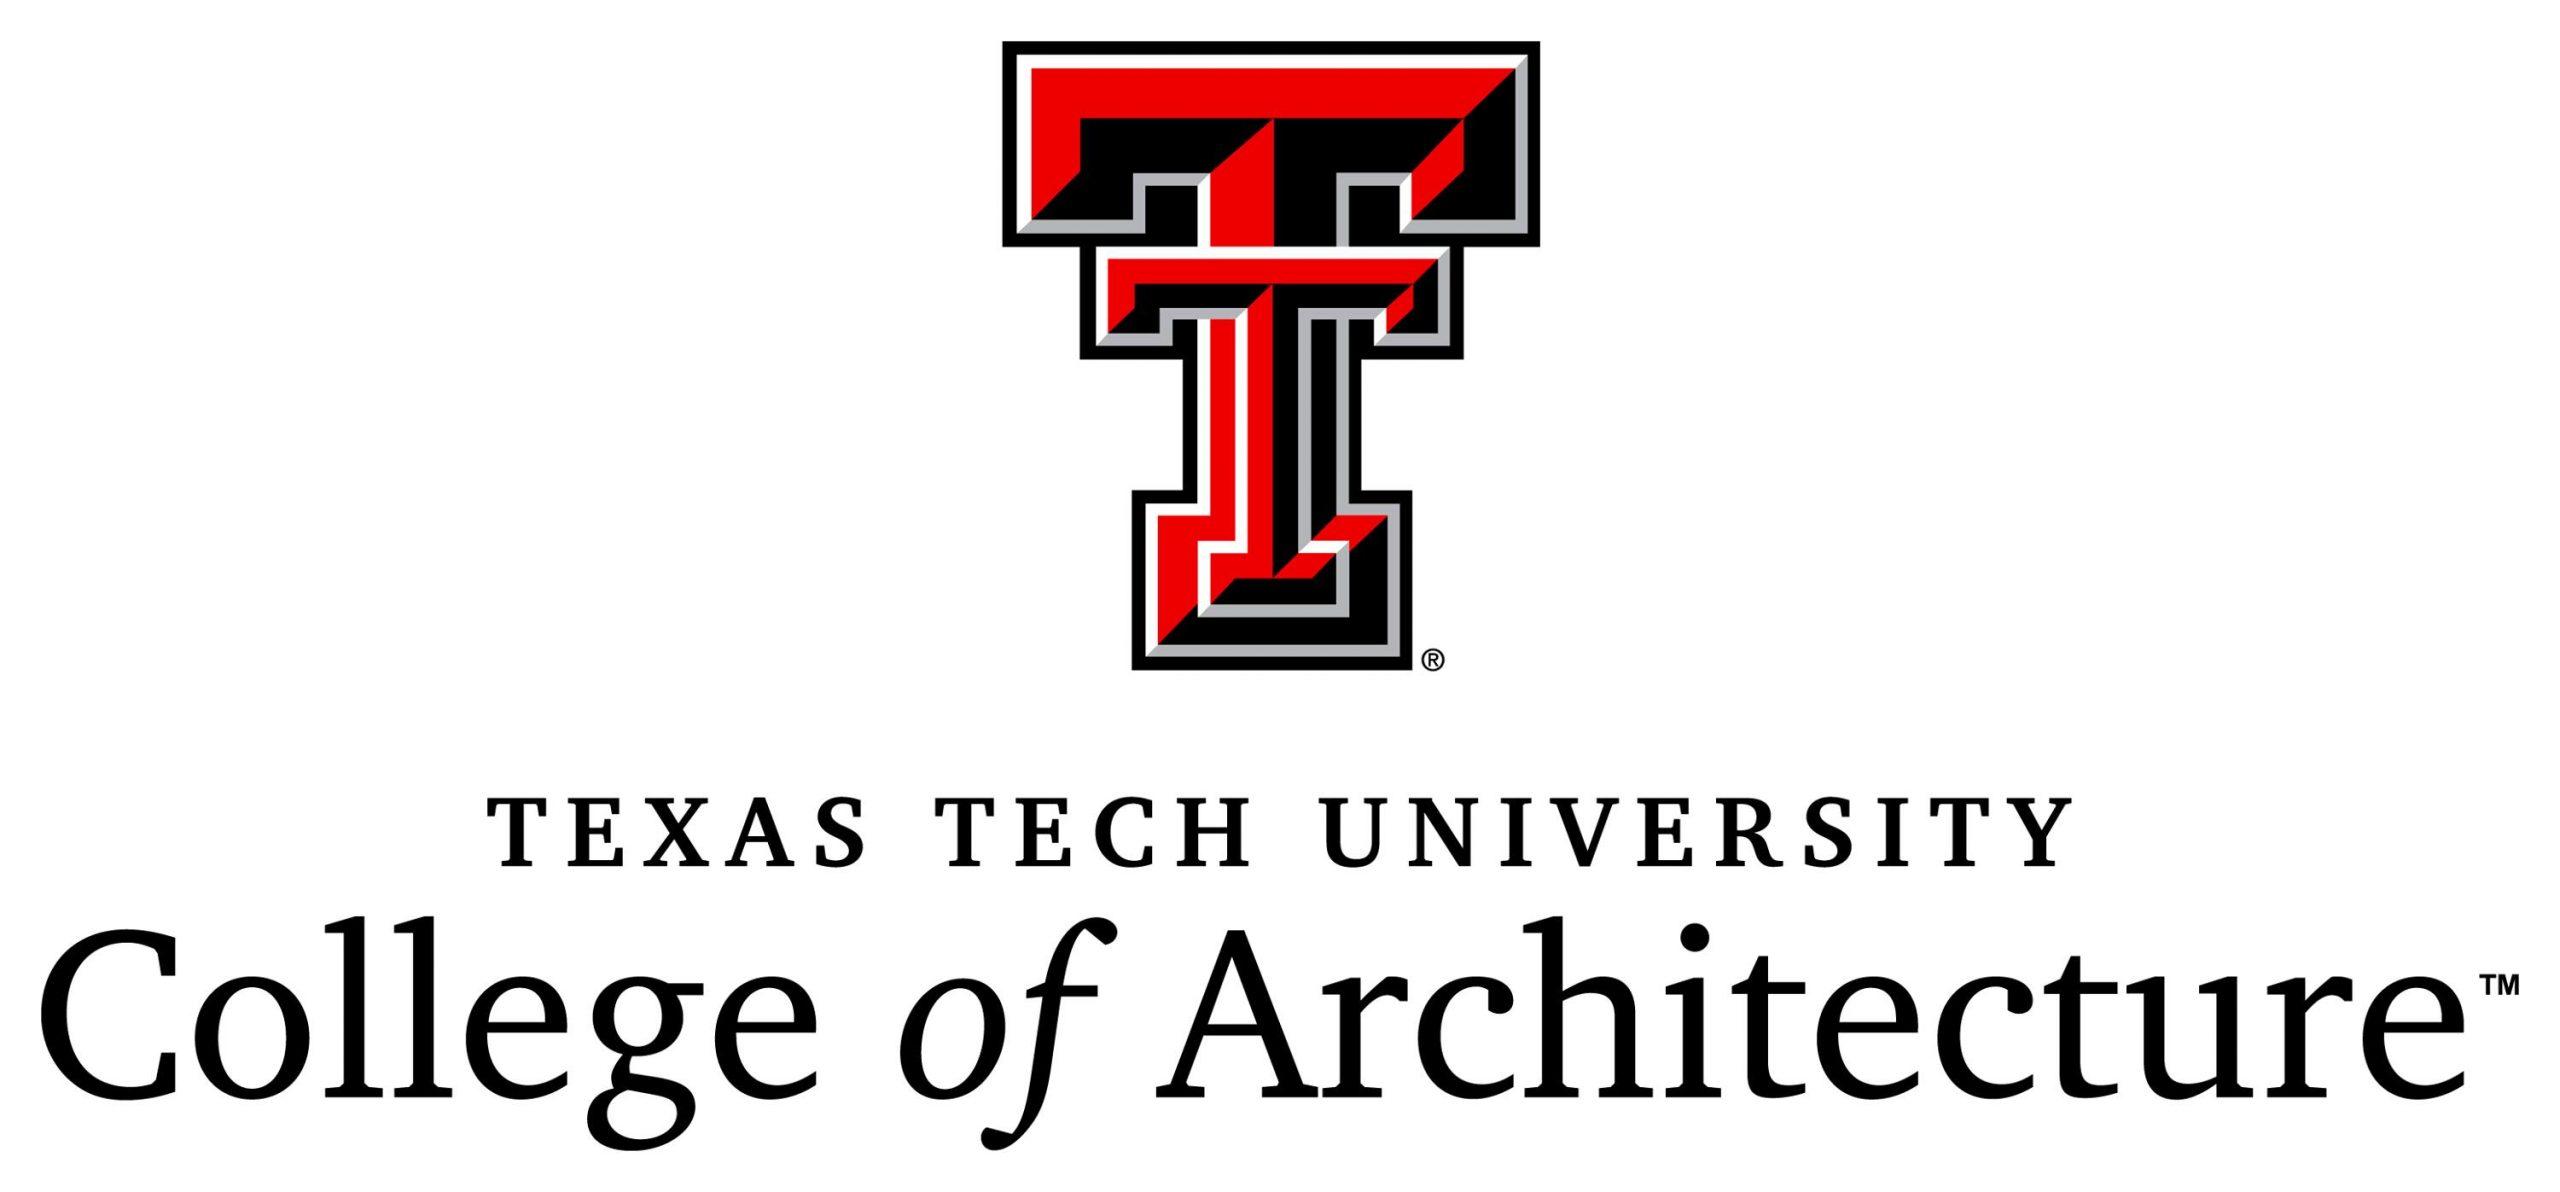 Texas Tech Architecture Lecture Series With Texas Tech University Academic Calendar